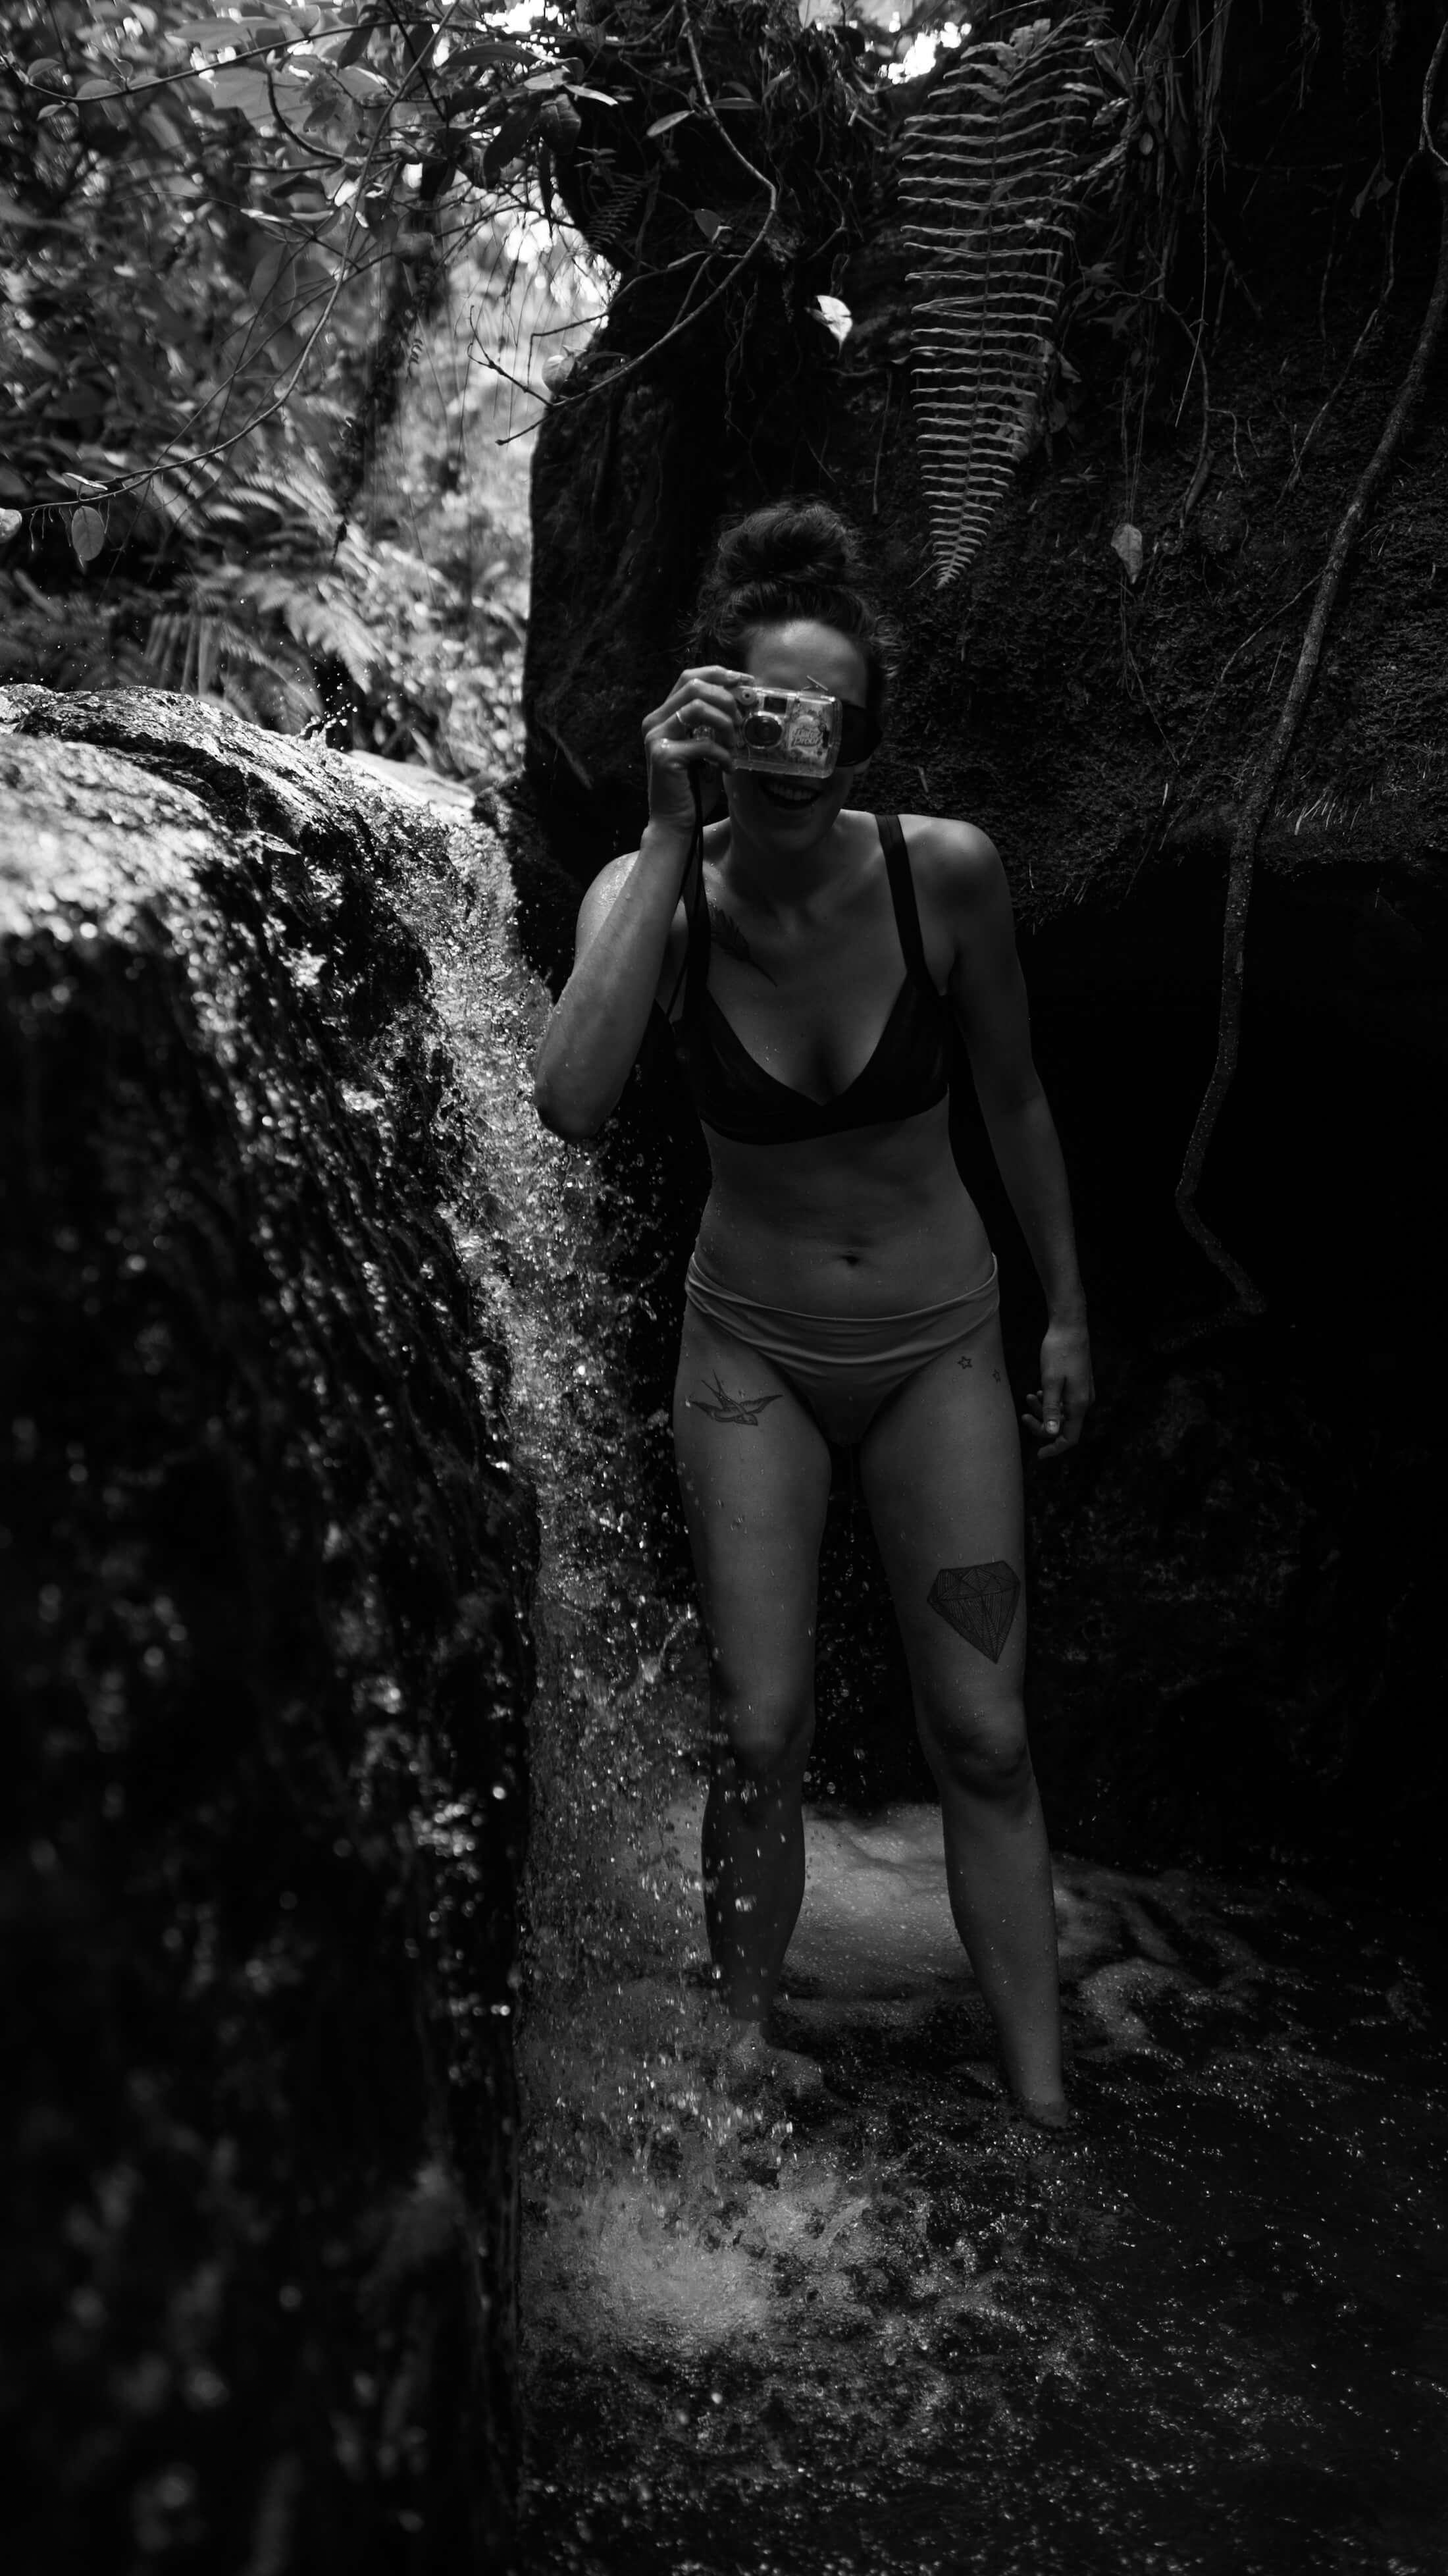 engle-olson-photography-puerto-rico-44.jpg